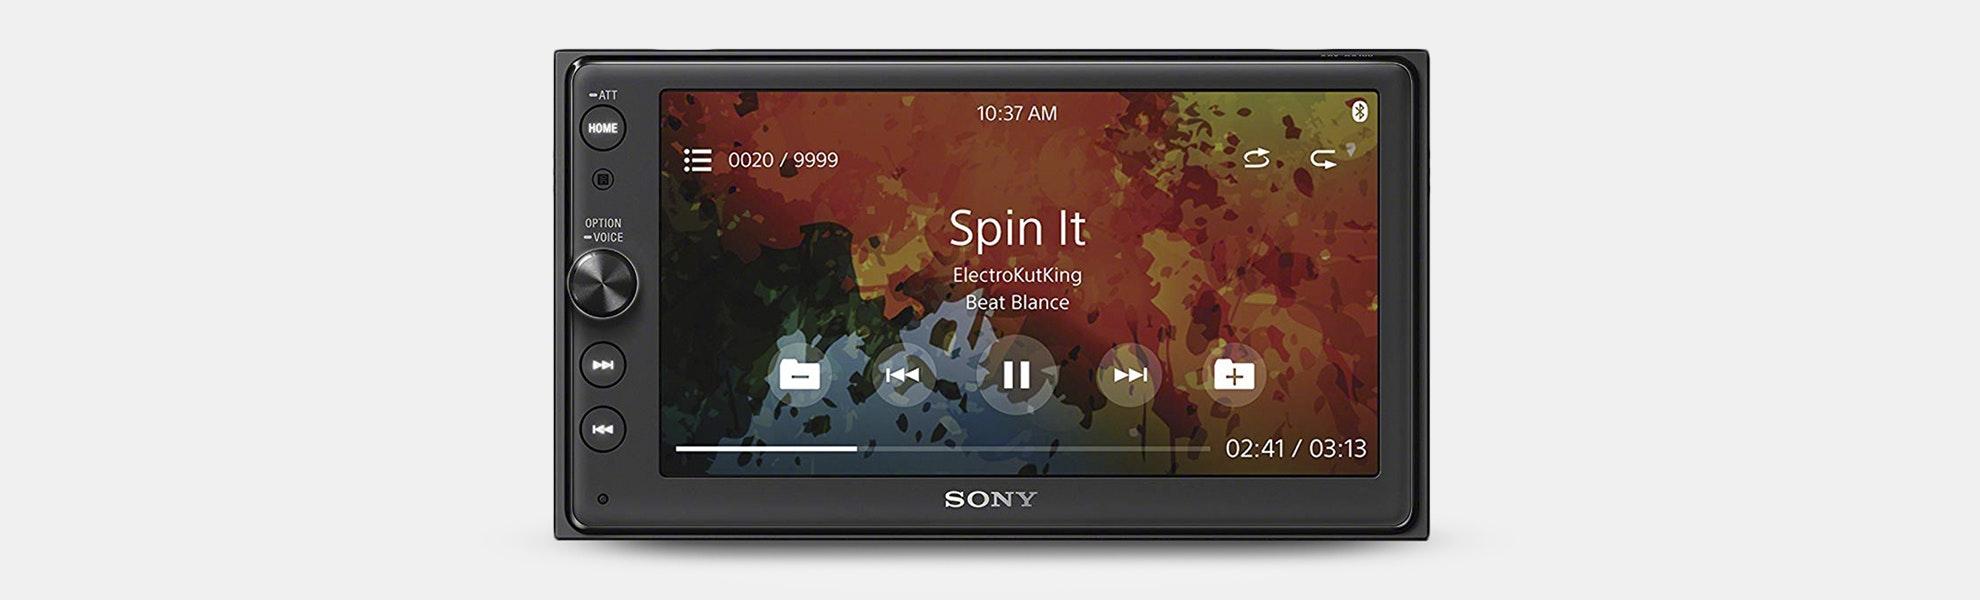 "Sony 6.4"" Multimedia Receiver w/ Bluetooth"